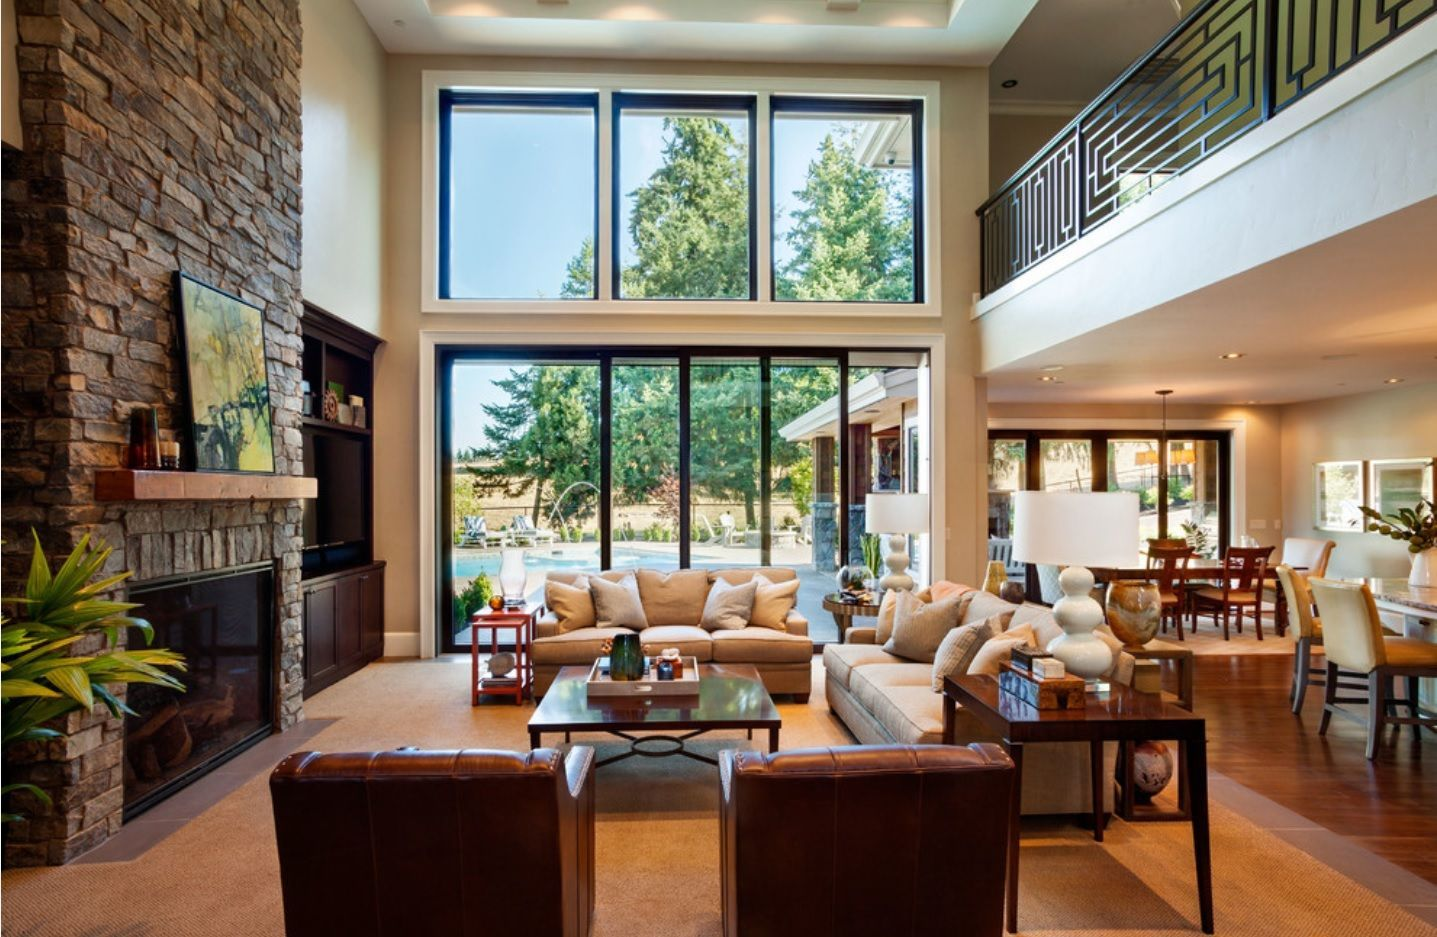 Living Room Layout Design Decoration Ideas Small & double living room ideas | Nakedsnakepress.com